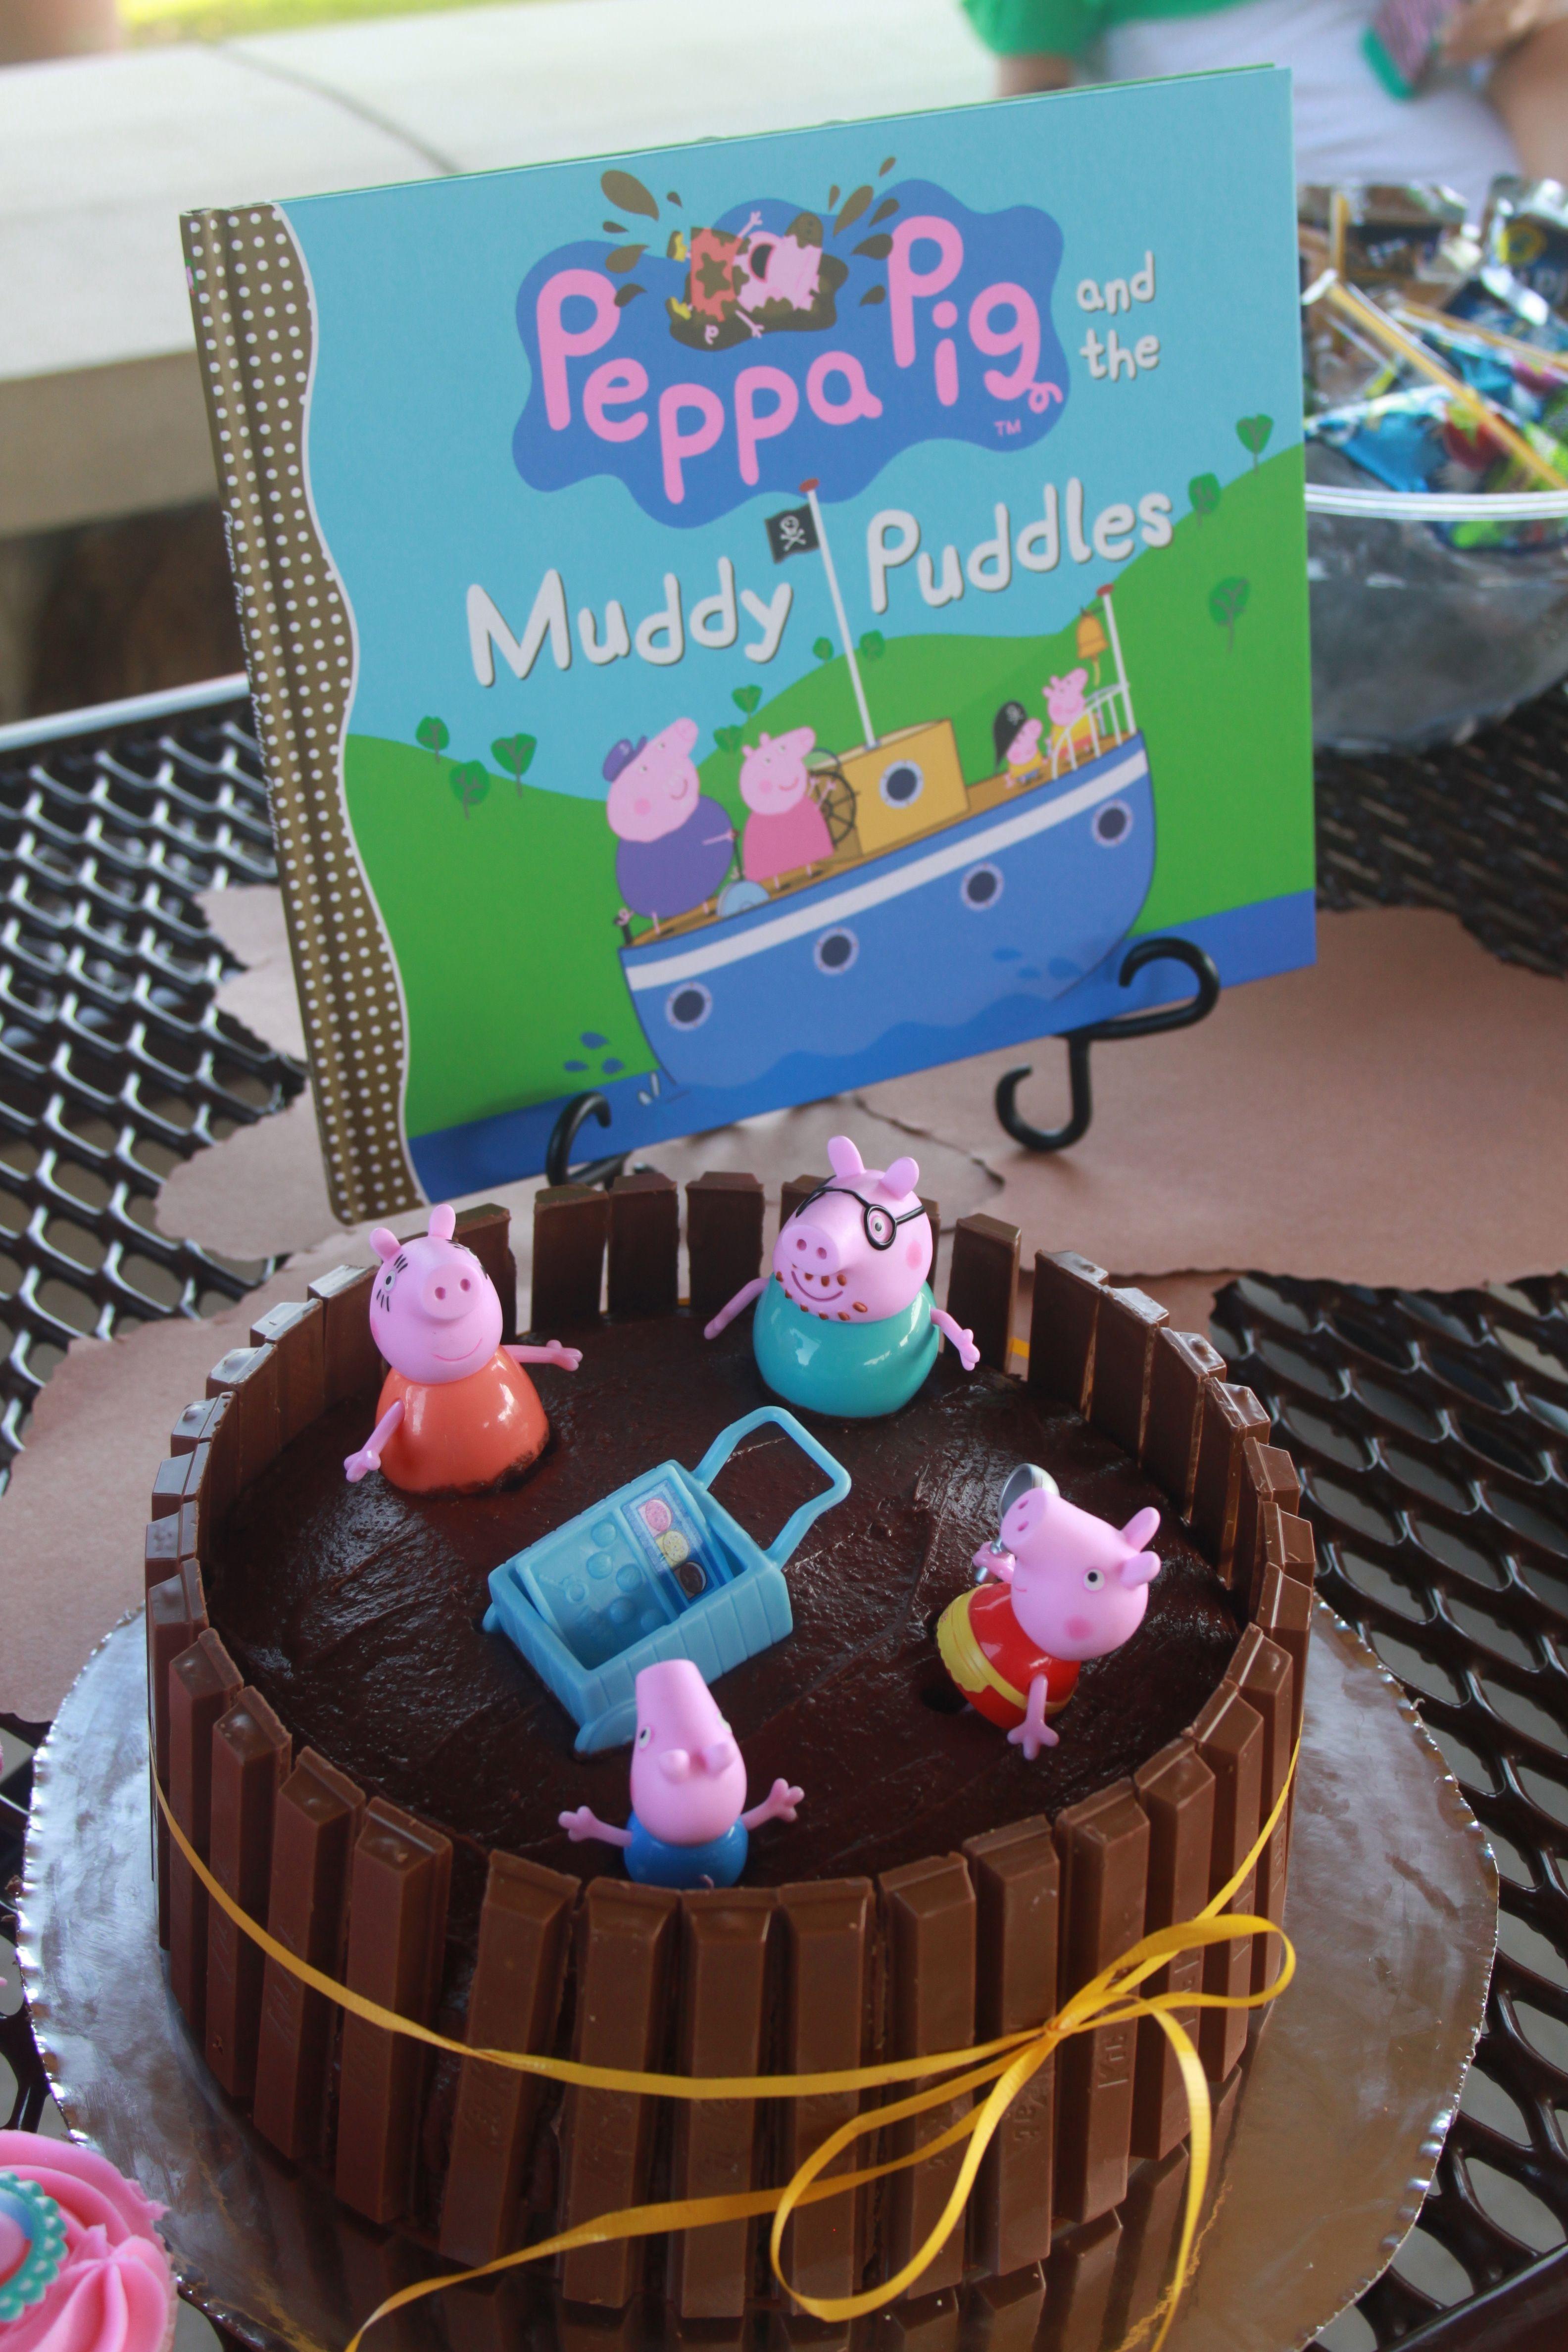 Peppa Pig Birthday Cake Demi's 3rd Bday Party Ideas Pinterest Peppa pig birthday cake, Pig